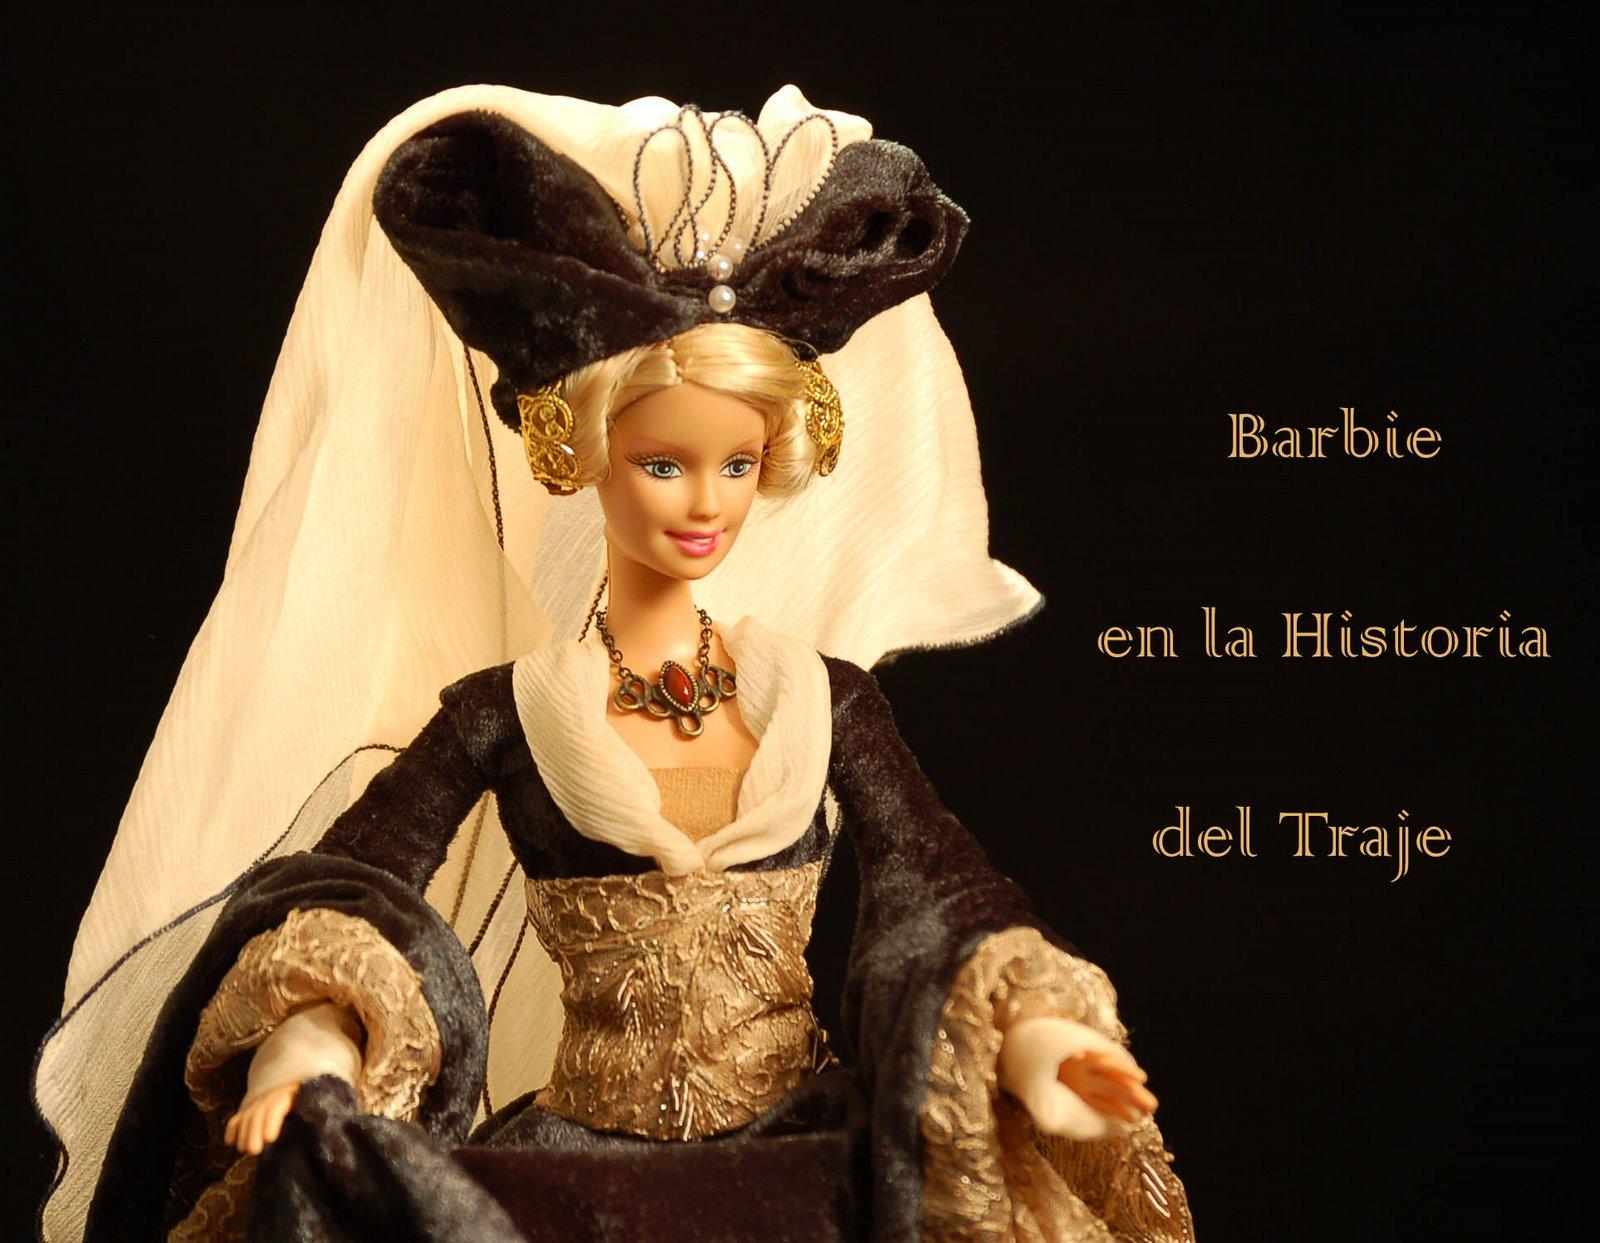 Barbie en la Historia